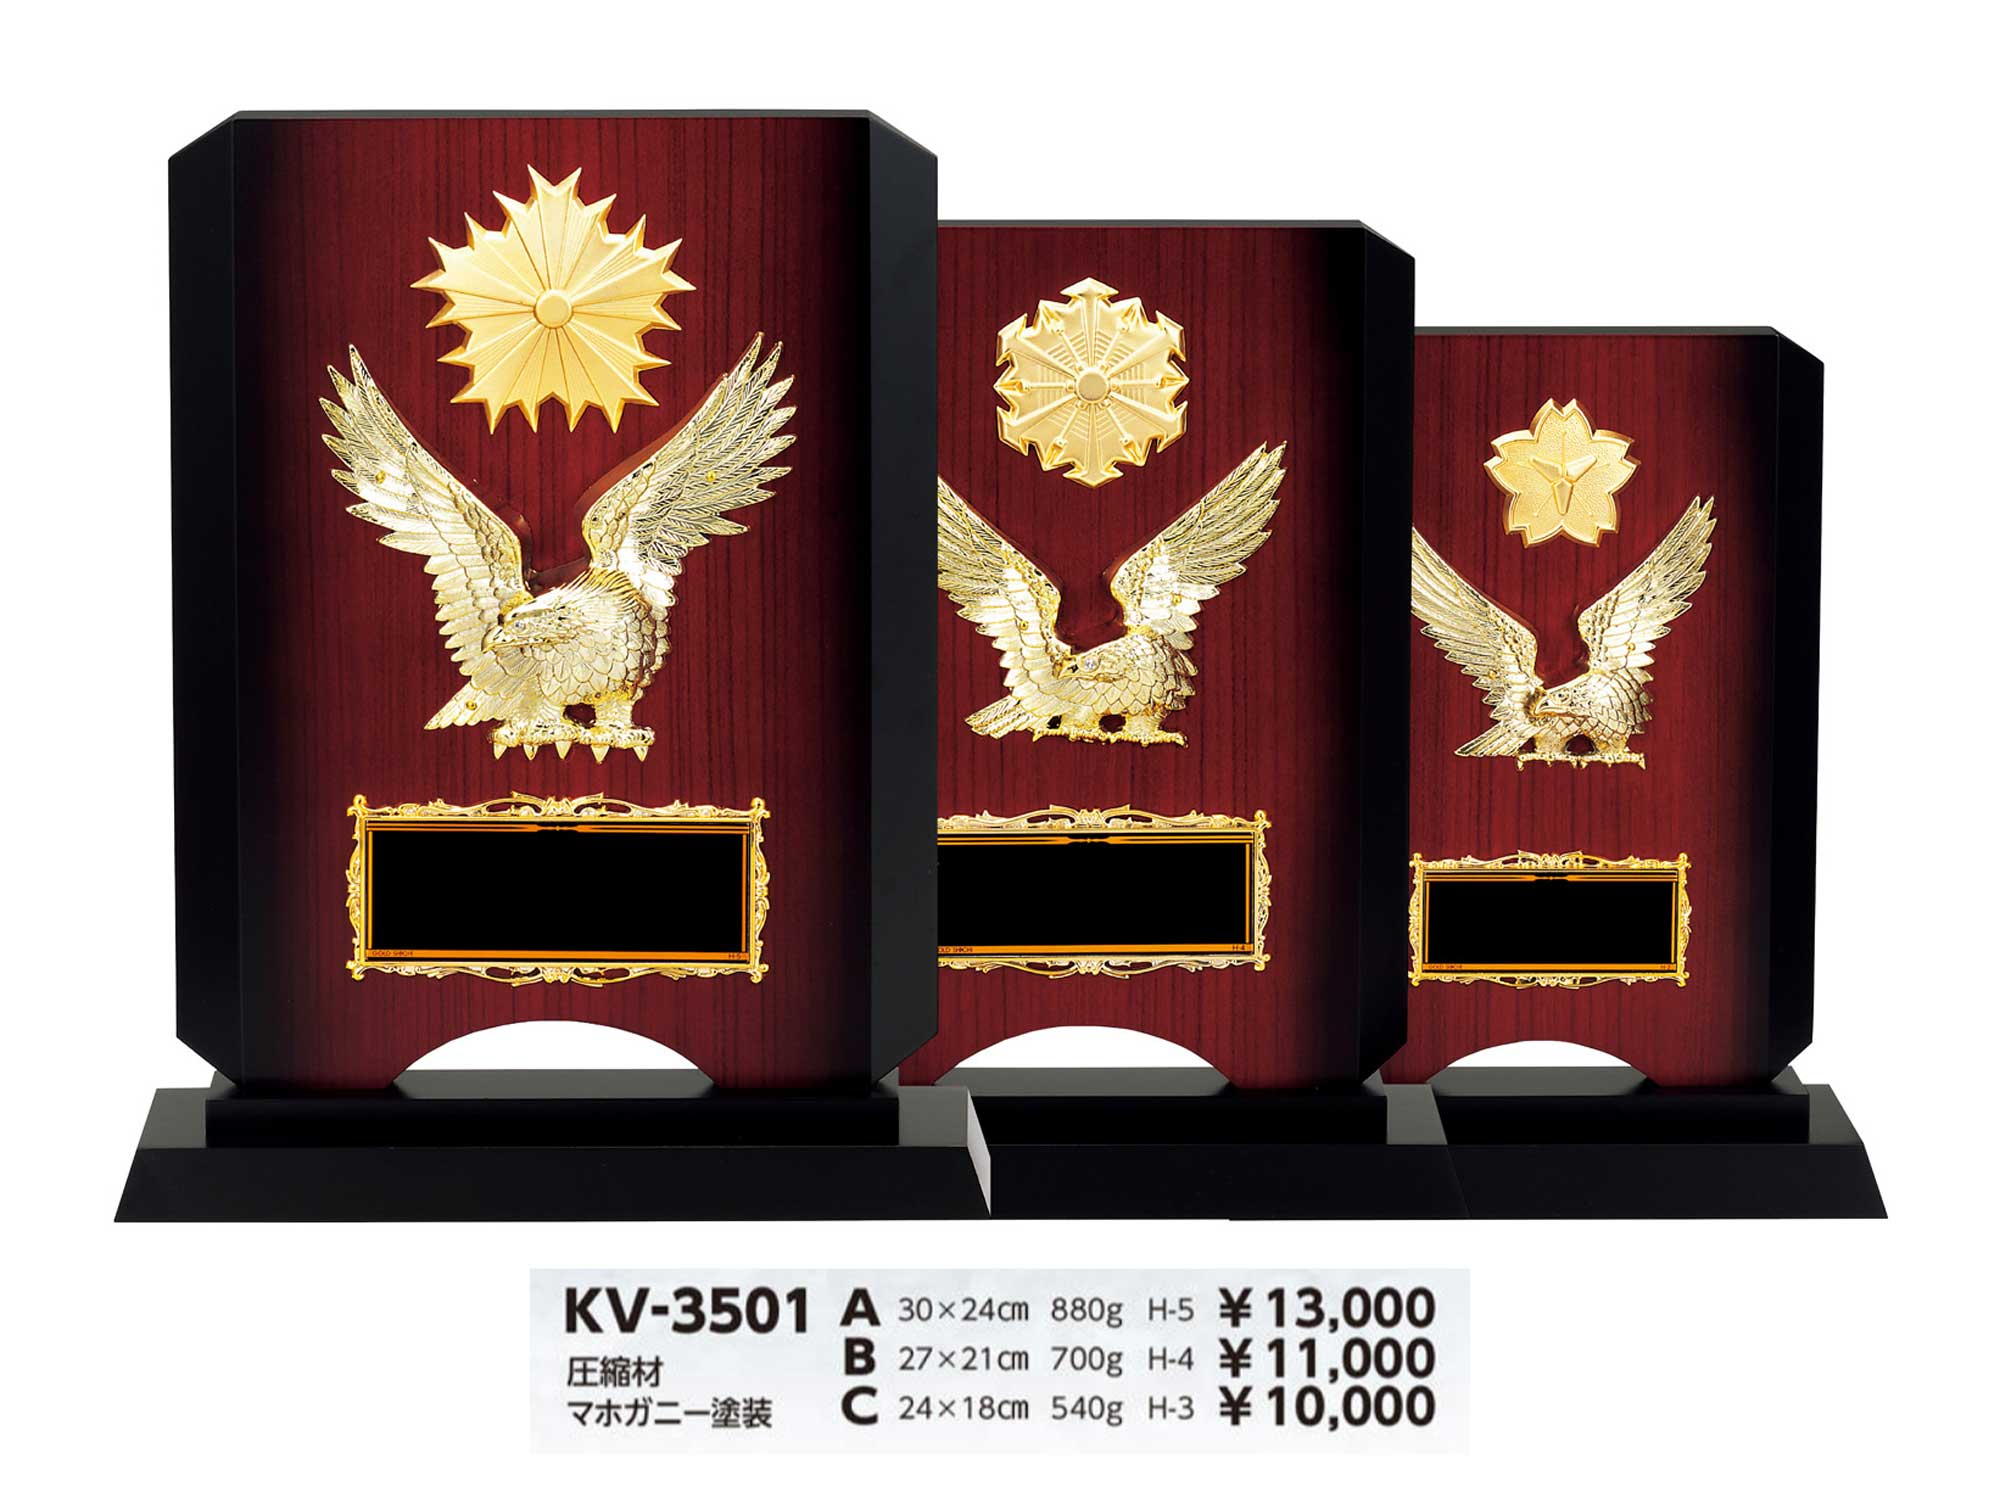 KV3501